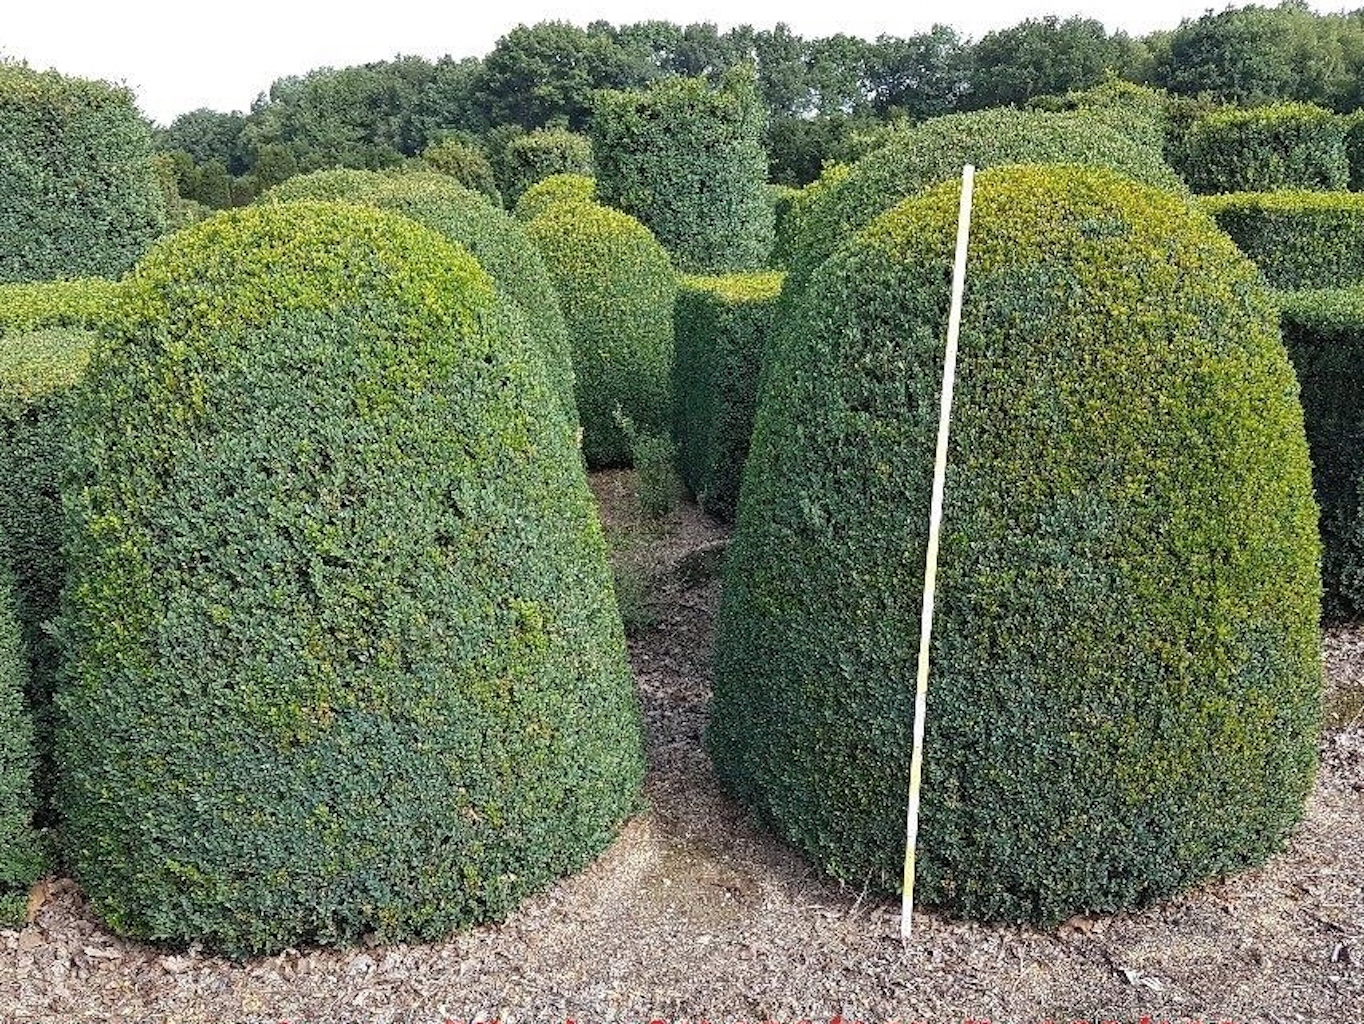 Buxus sempervirens beehives 120-140cm high, 100-120cm diameter